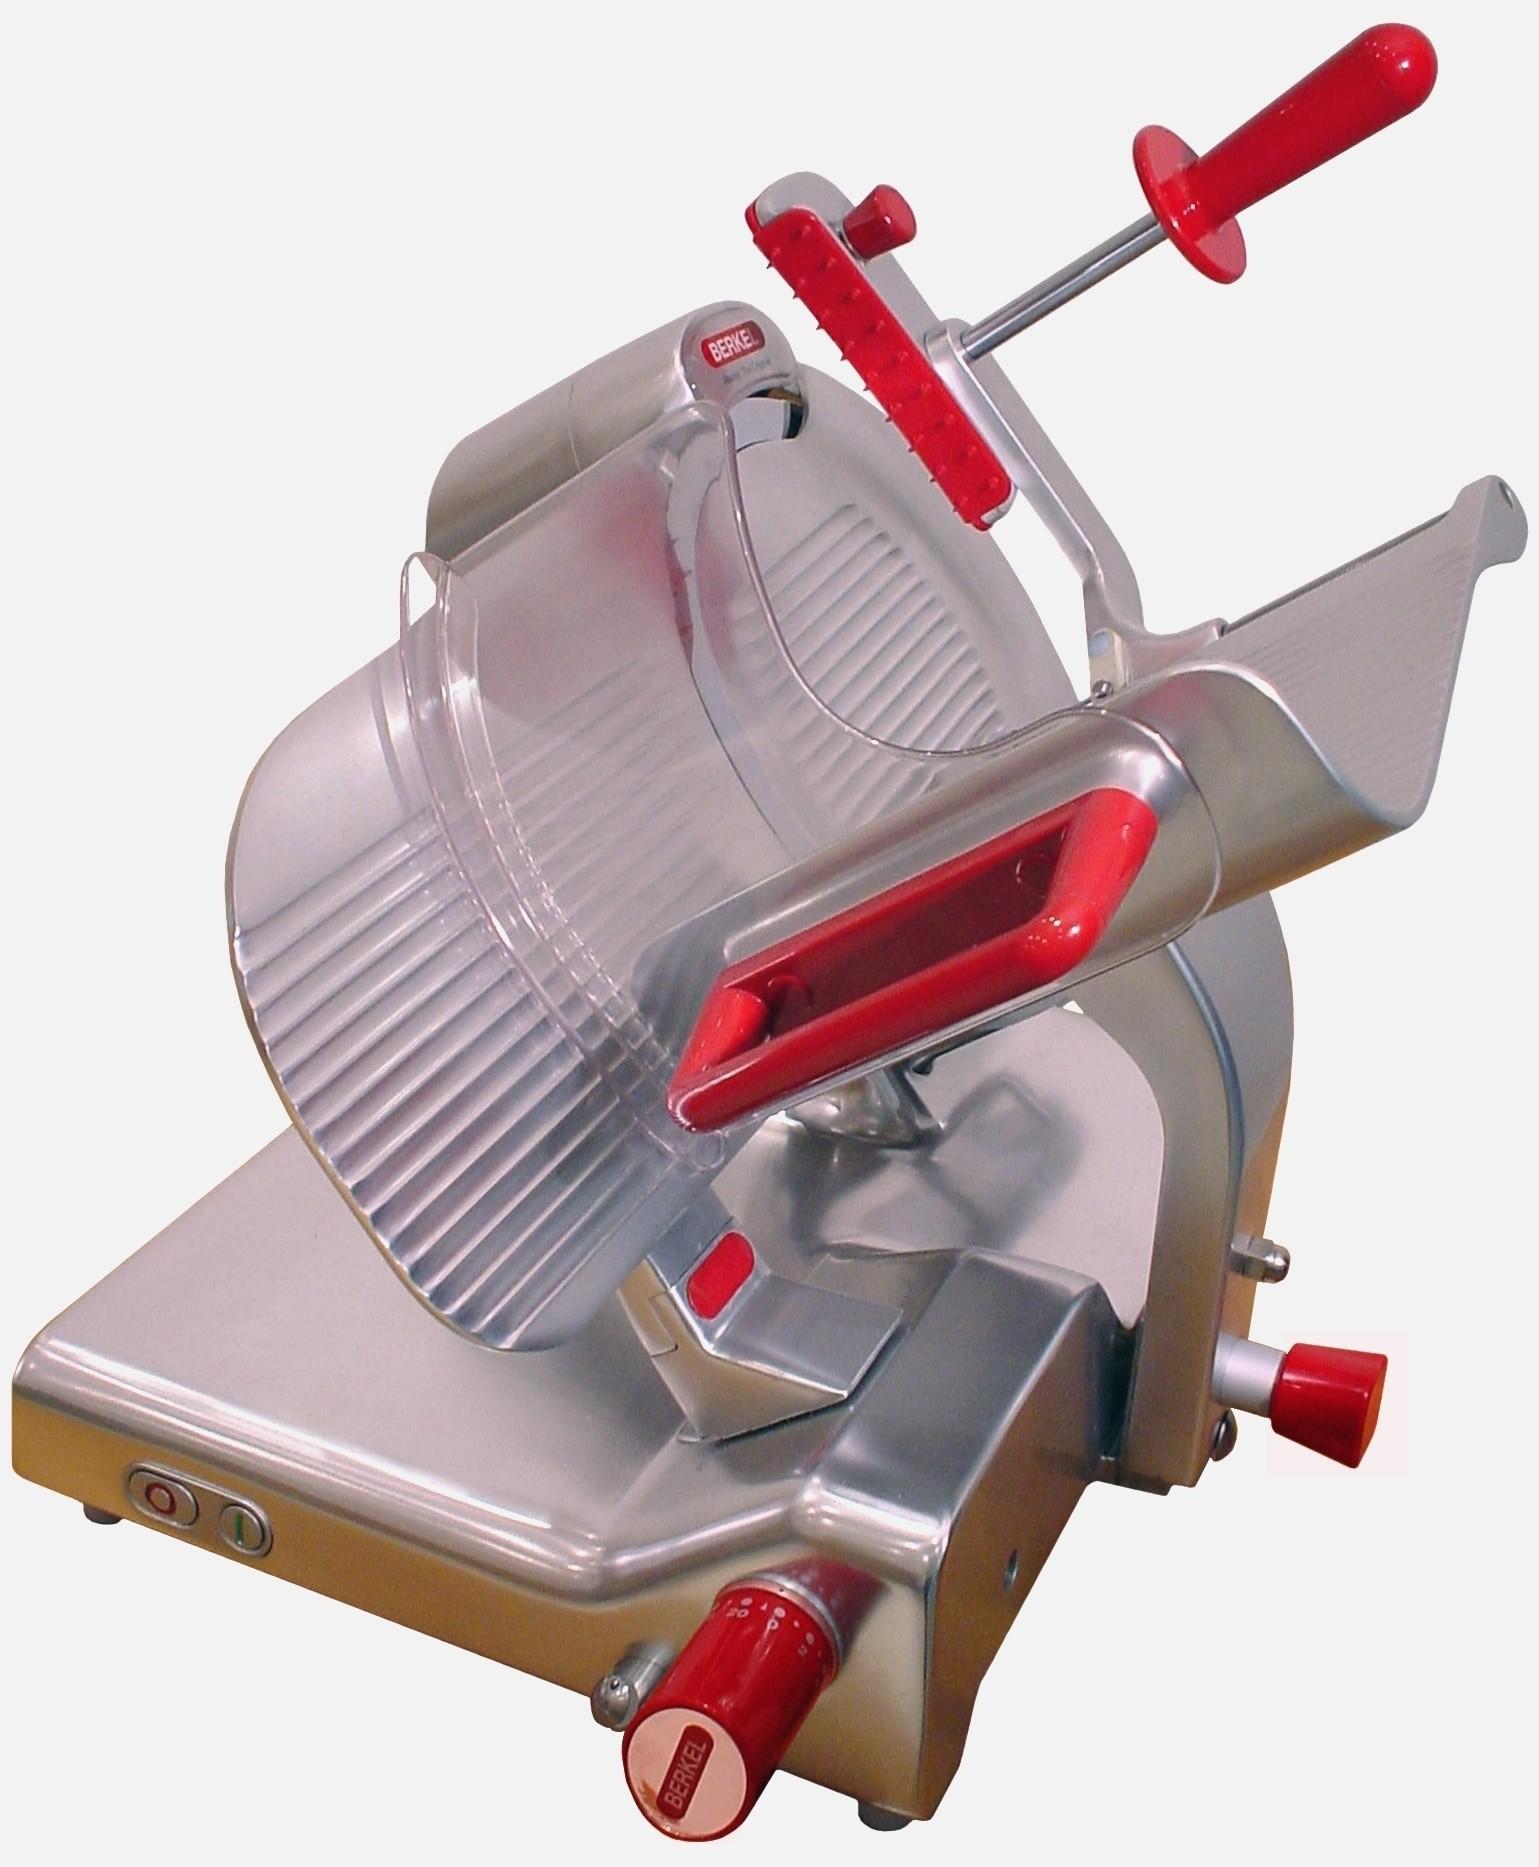 Berkel Slicer Parts Diagram Scs Of Berkel Slicer Parts Diagram